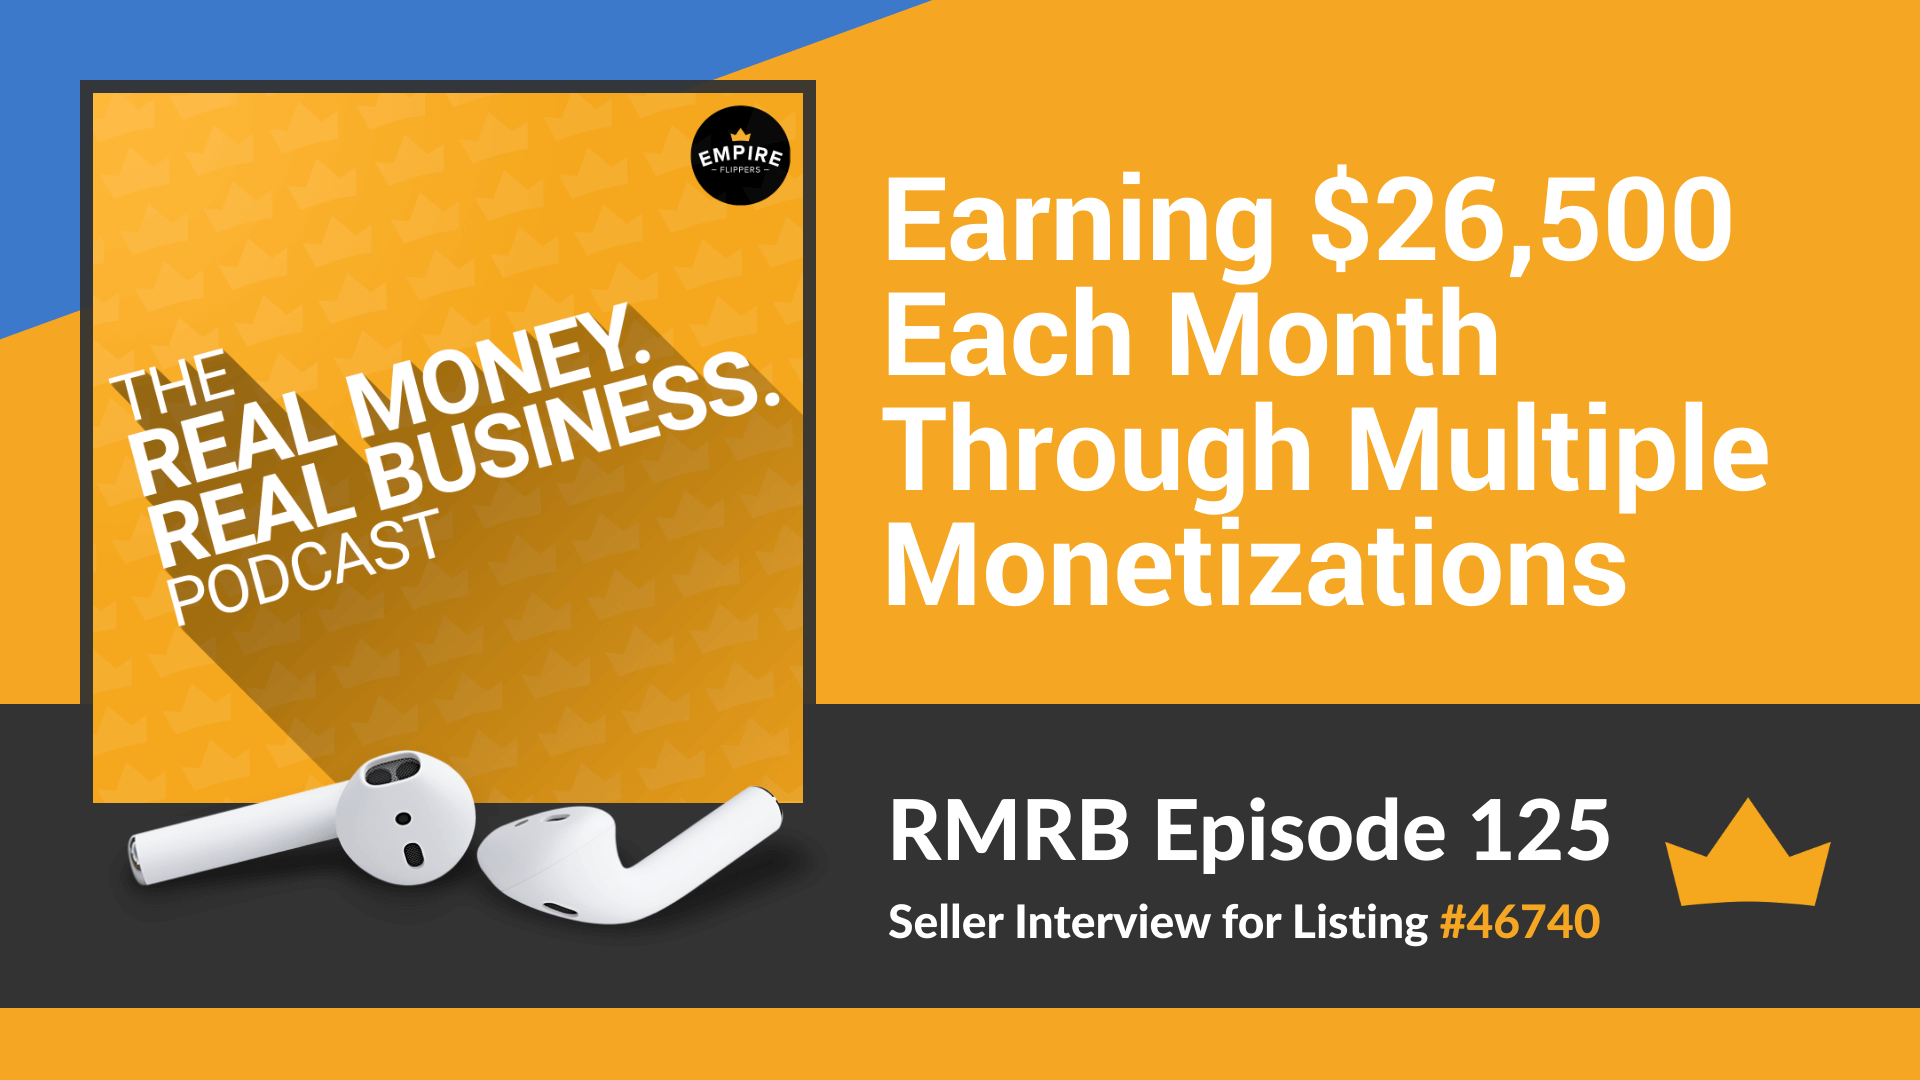 RMRB 125 - Earning $26,500 Each Month Through Multiple Monetizations